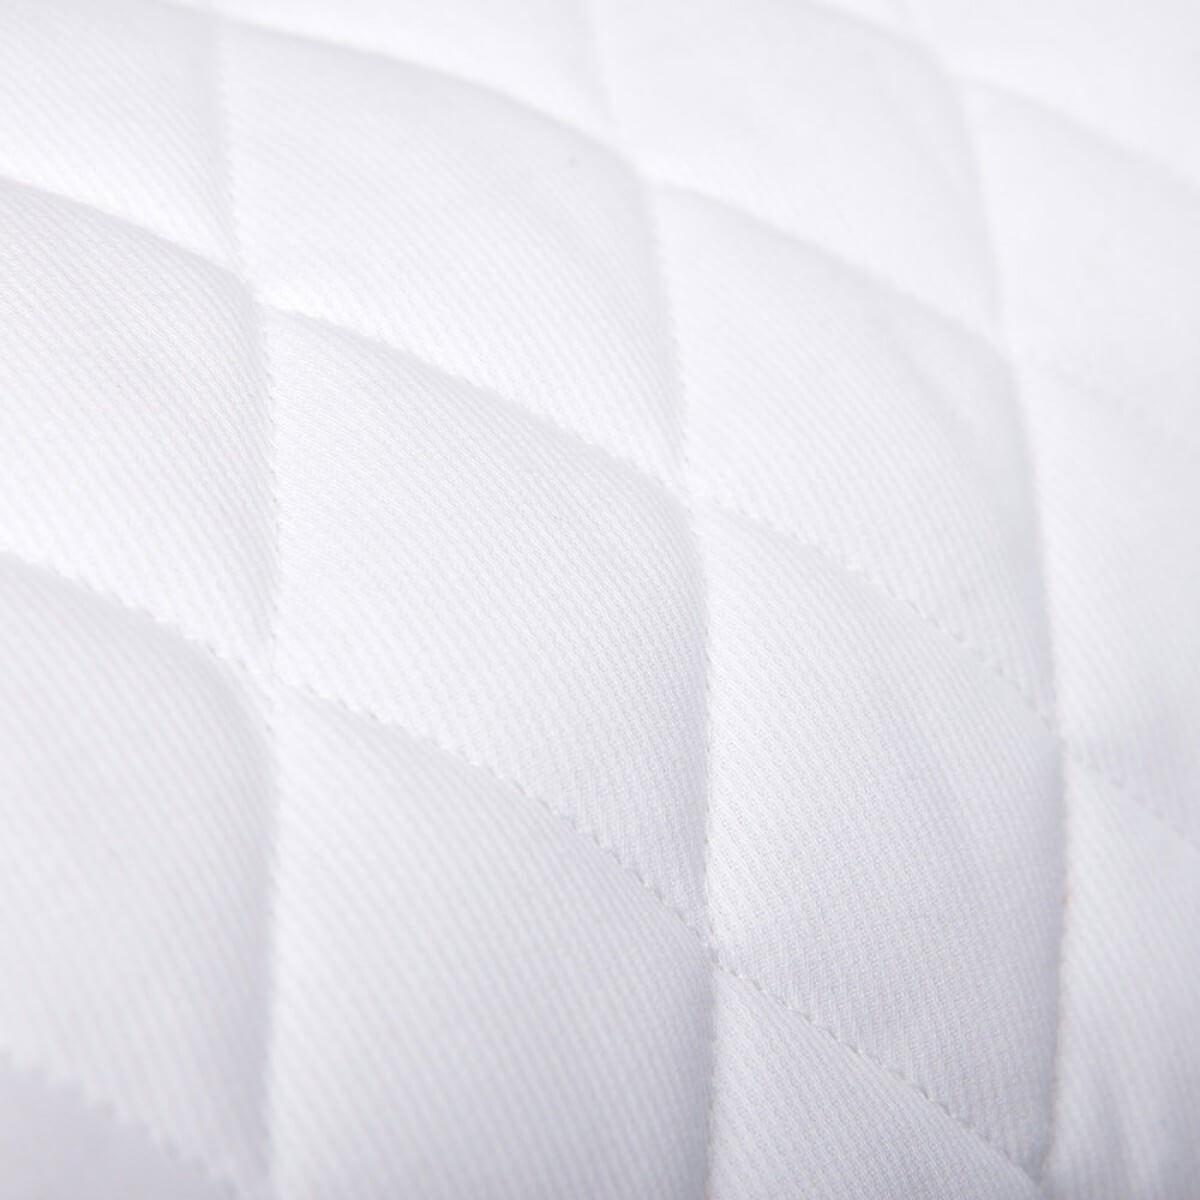 Tissu piqu de coton matelass uni blanc mercerie car fil - Tissu matelasse pour bebe ...